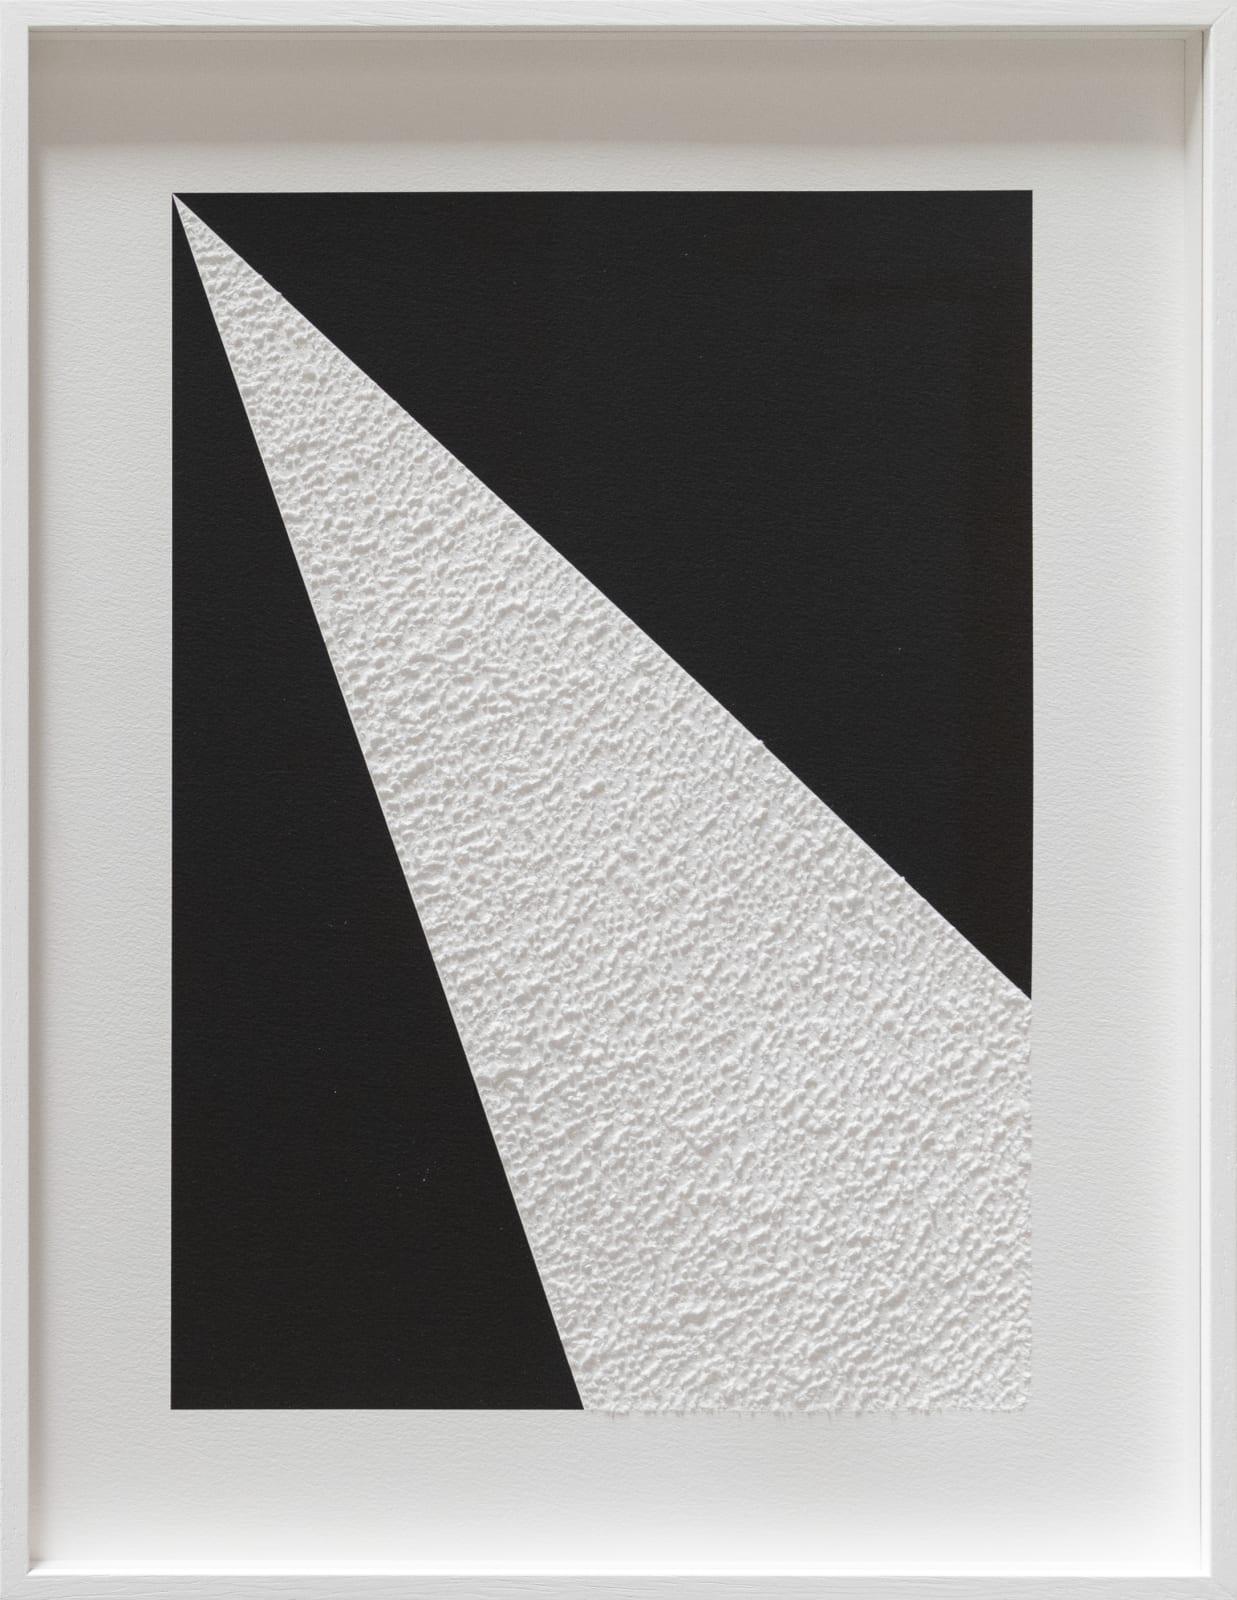 Mohammed Kazem, Sound of Angles No 3, 2020